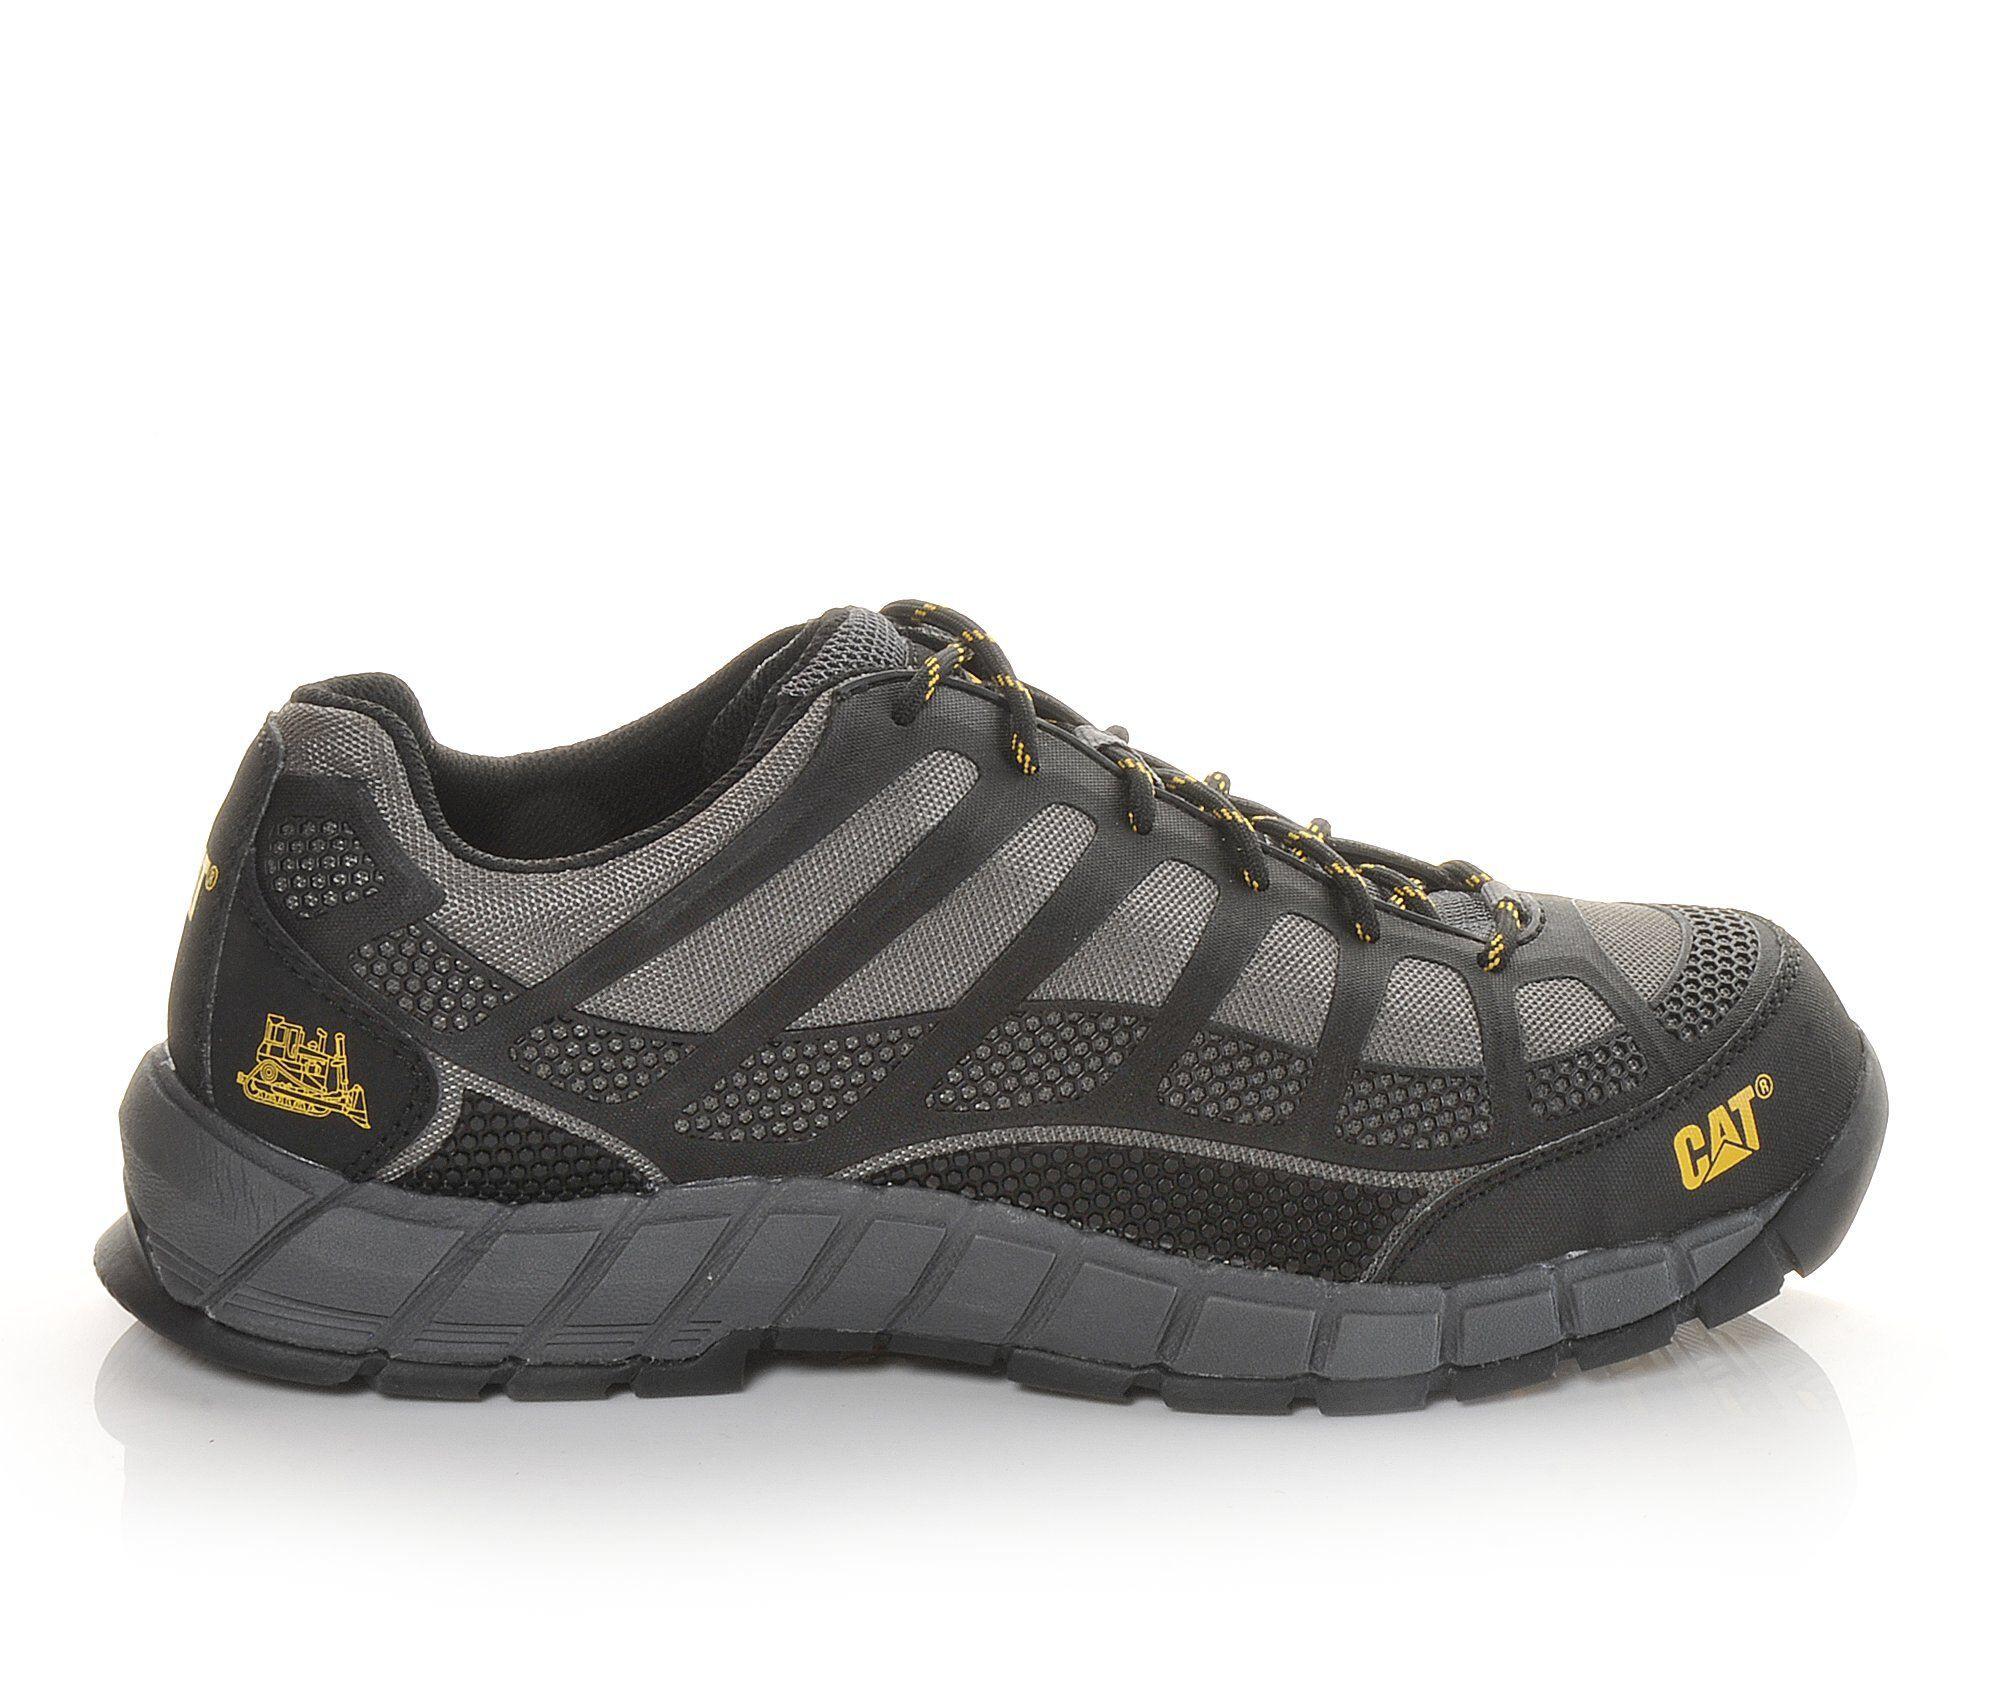 Men's Caterpillar Streamline Composite Toe Work Shoes Grey/Black